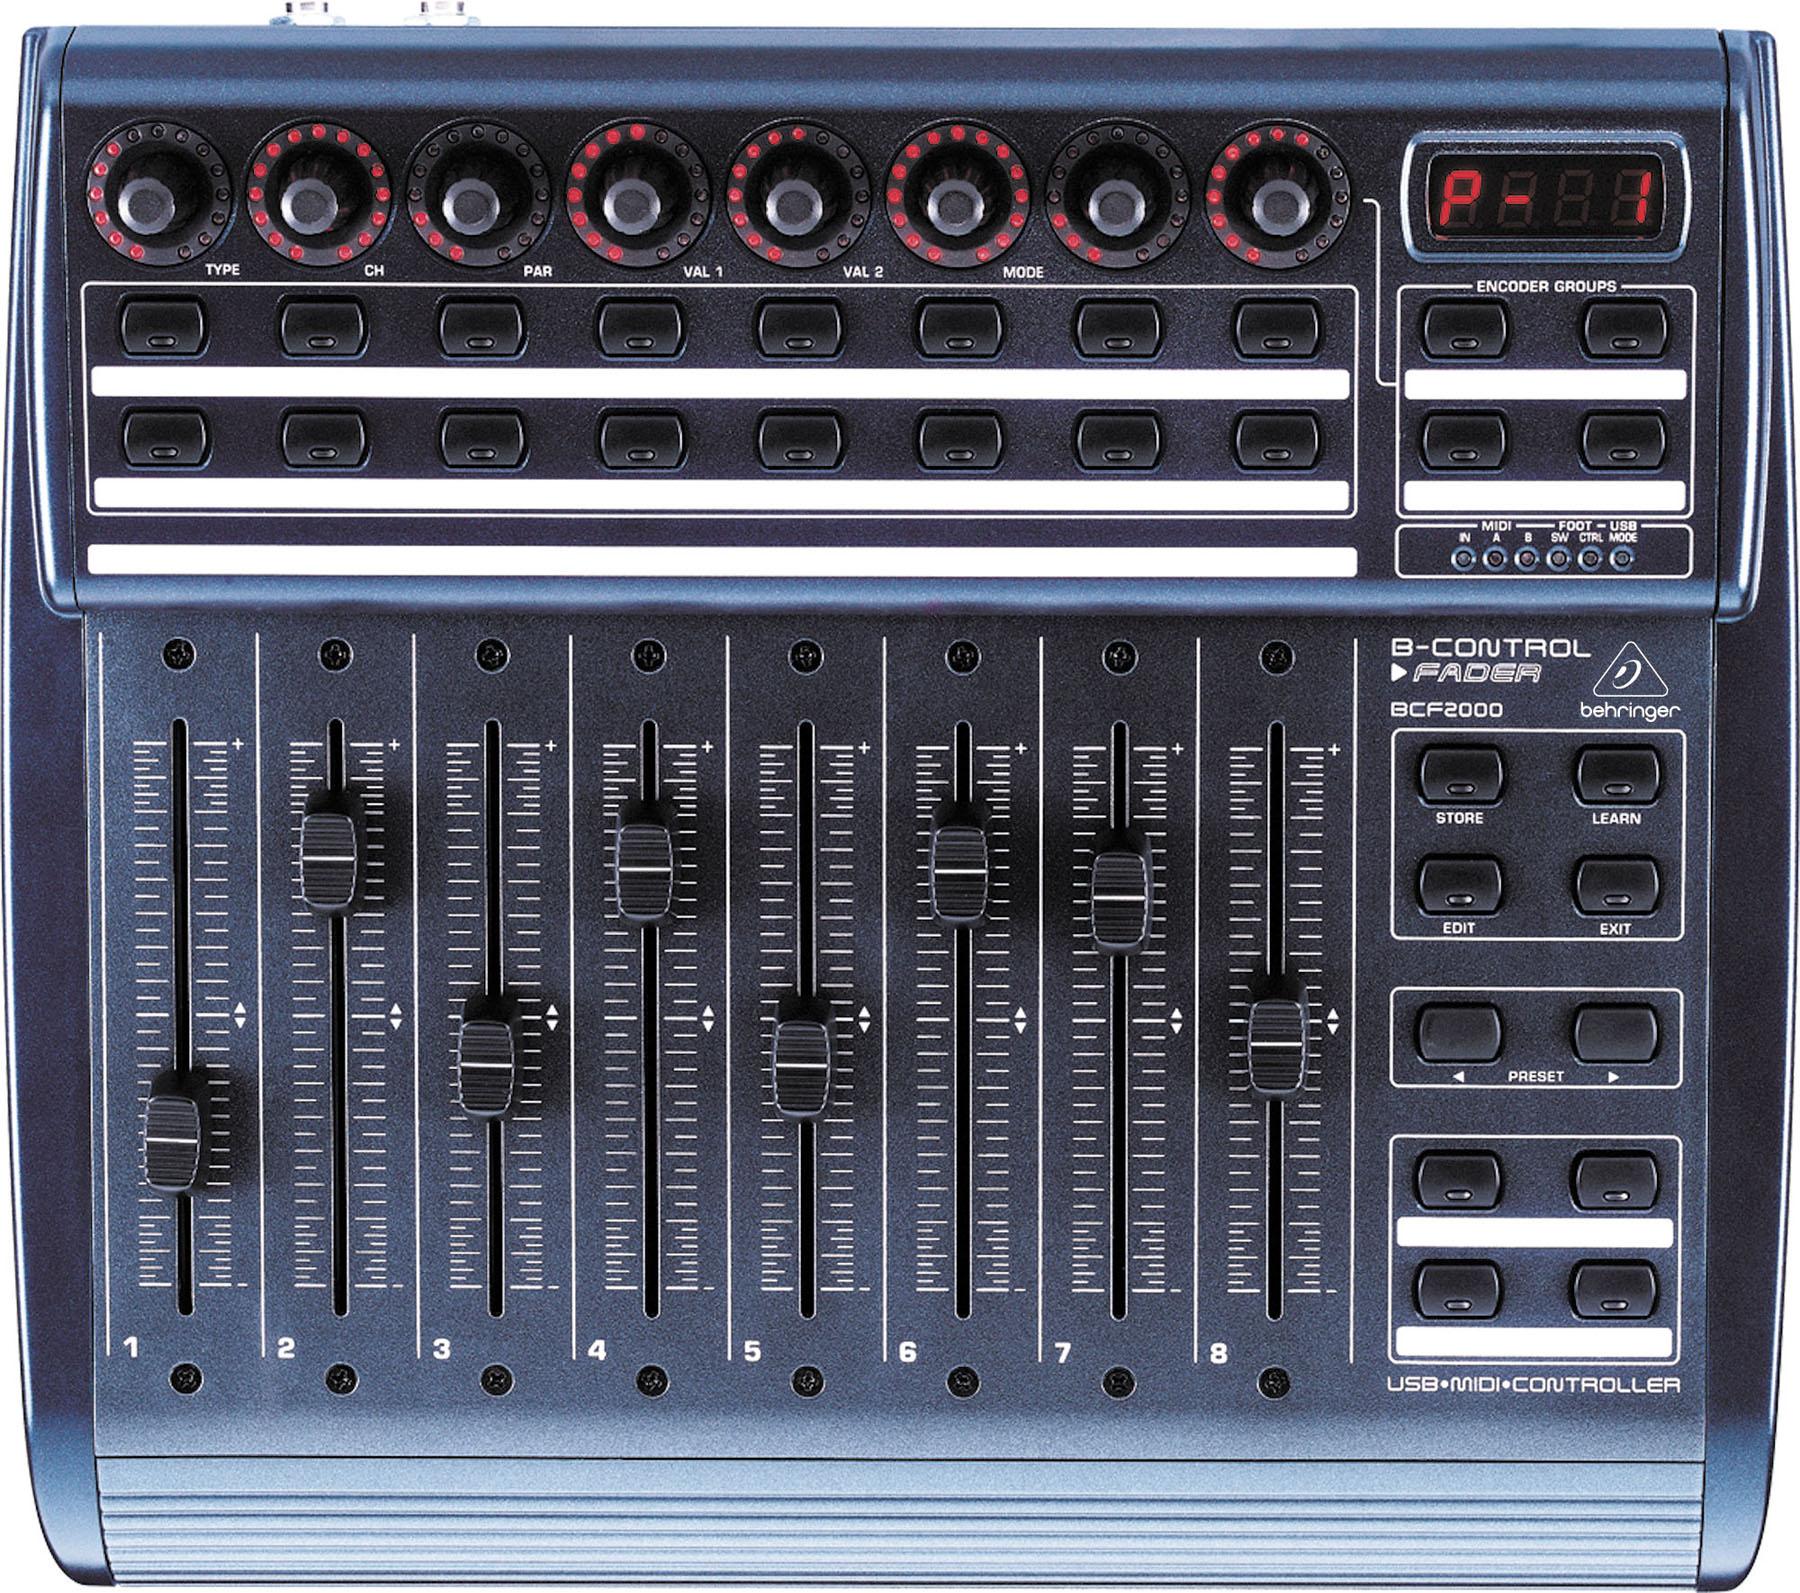 Behringer BCF2000 MIDI (A041999) - контроллер с USB подключением (Blue) midi контроллер g volca sample